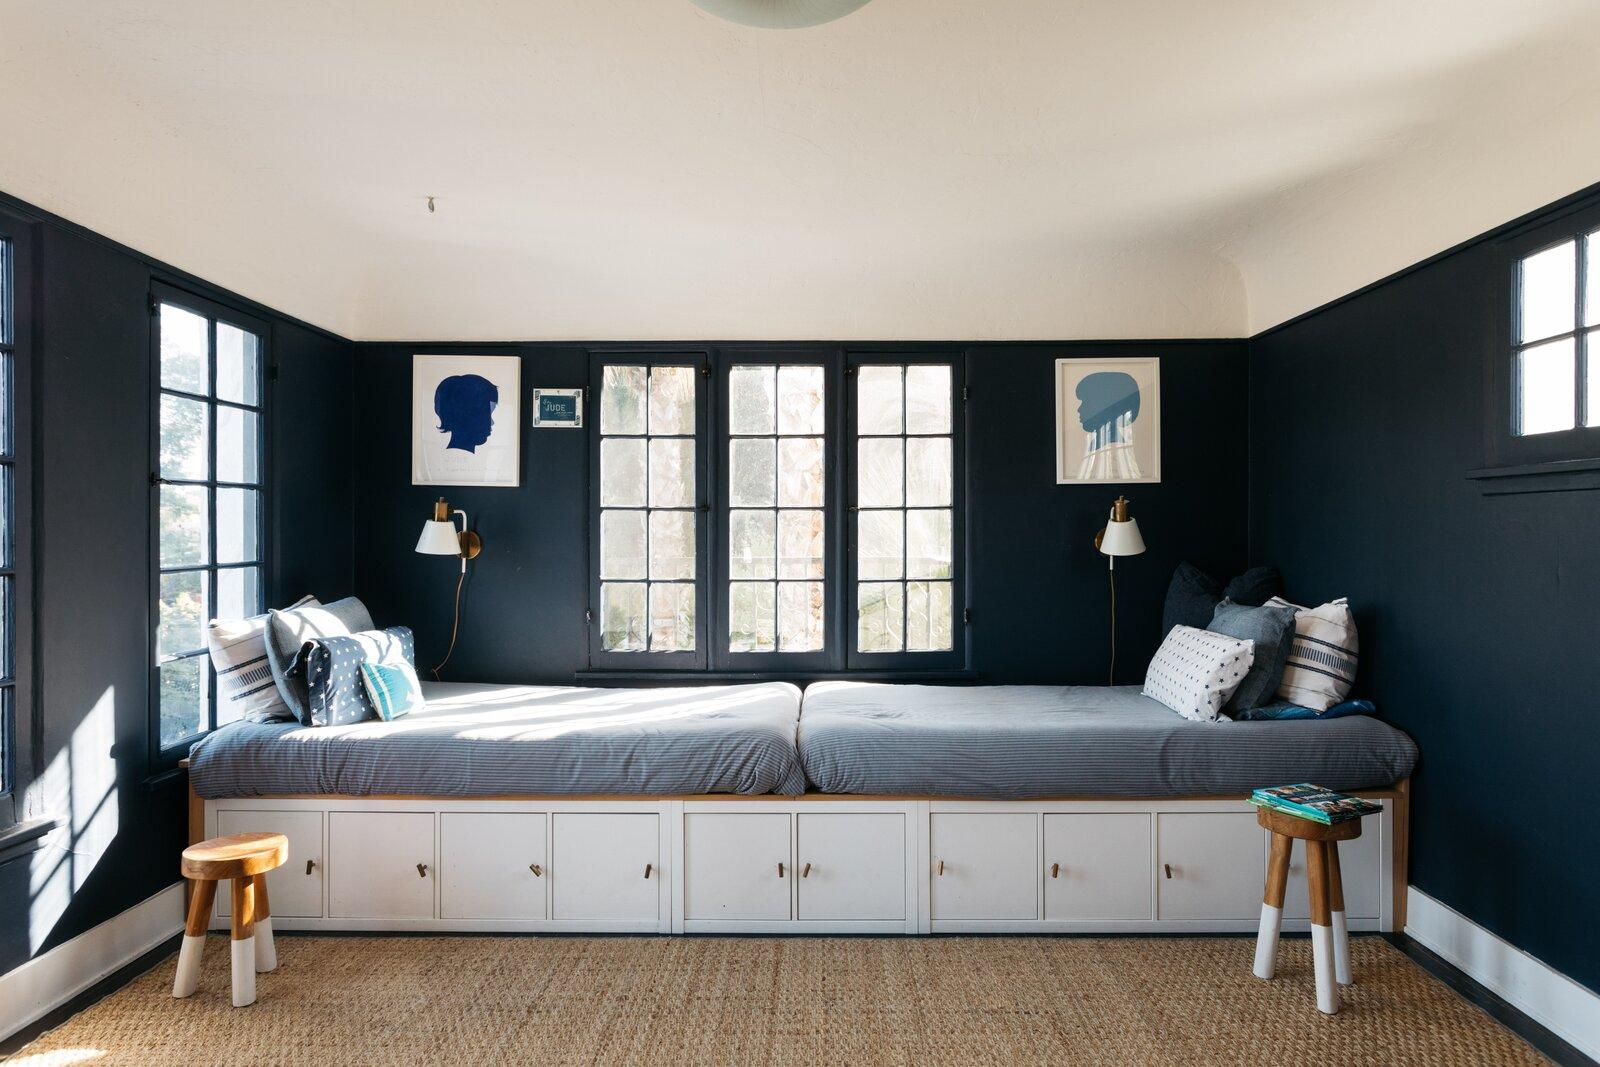 1920s Spanish Revival home bedroom